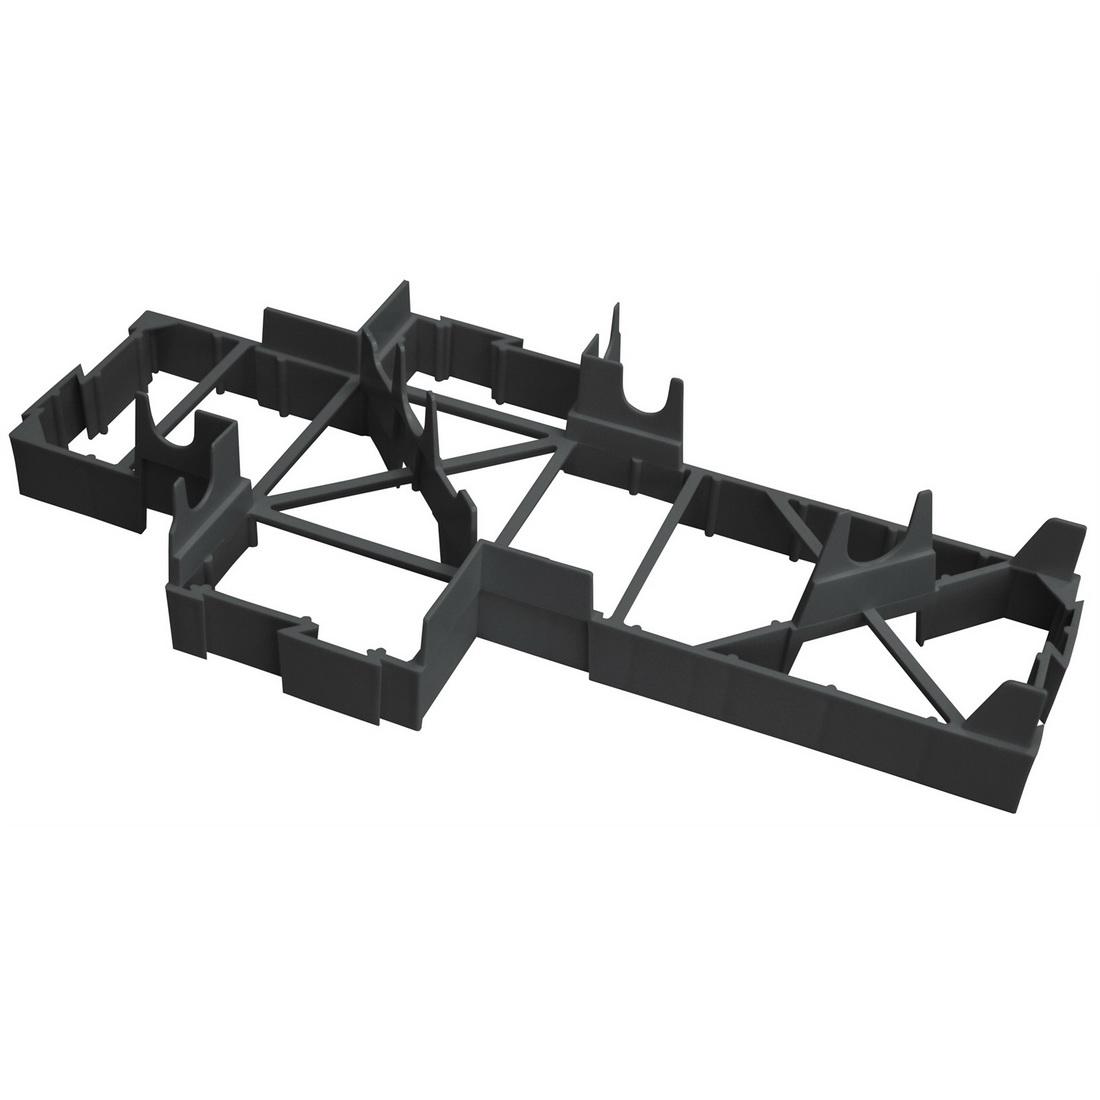 Expol Unimax Tuff Pod Spacer 50 x 200 x 400 mm Black SPACERMAX